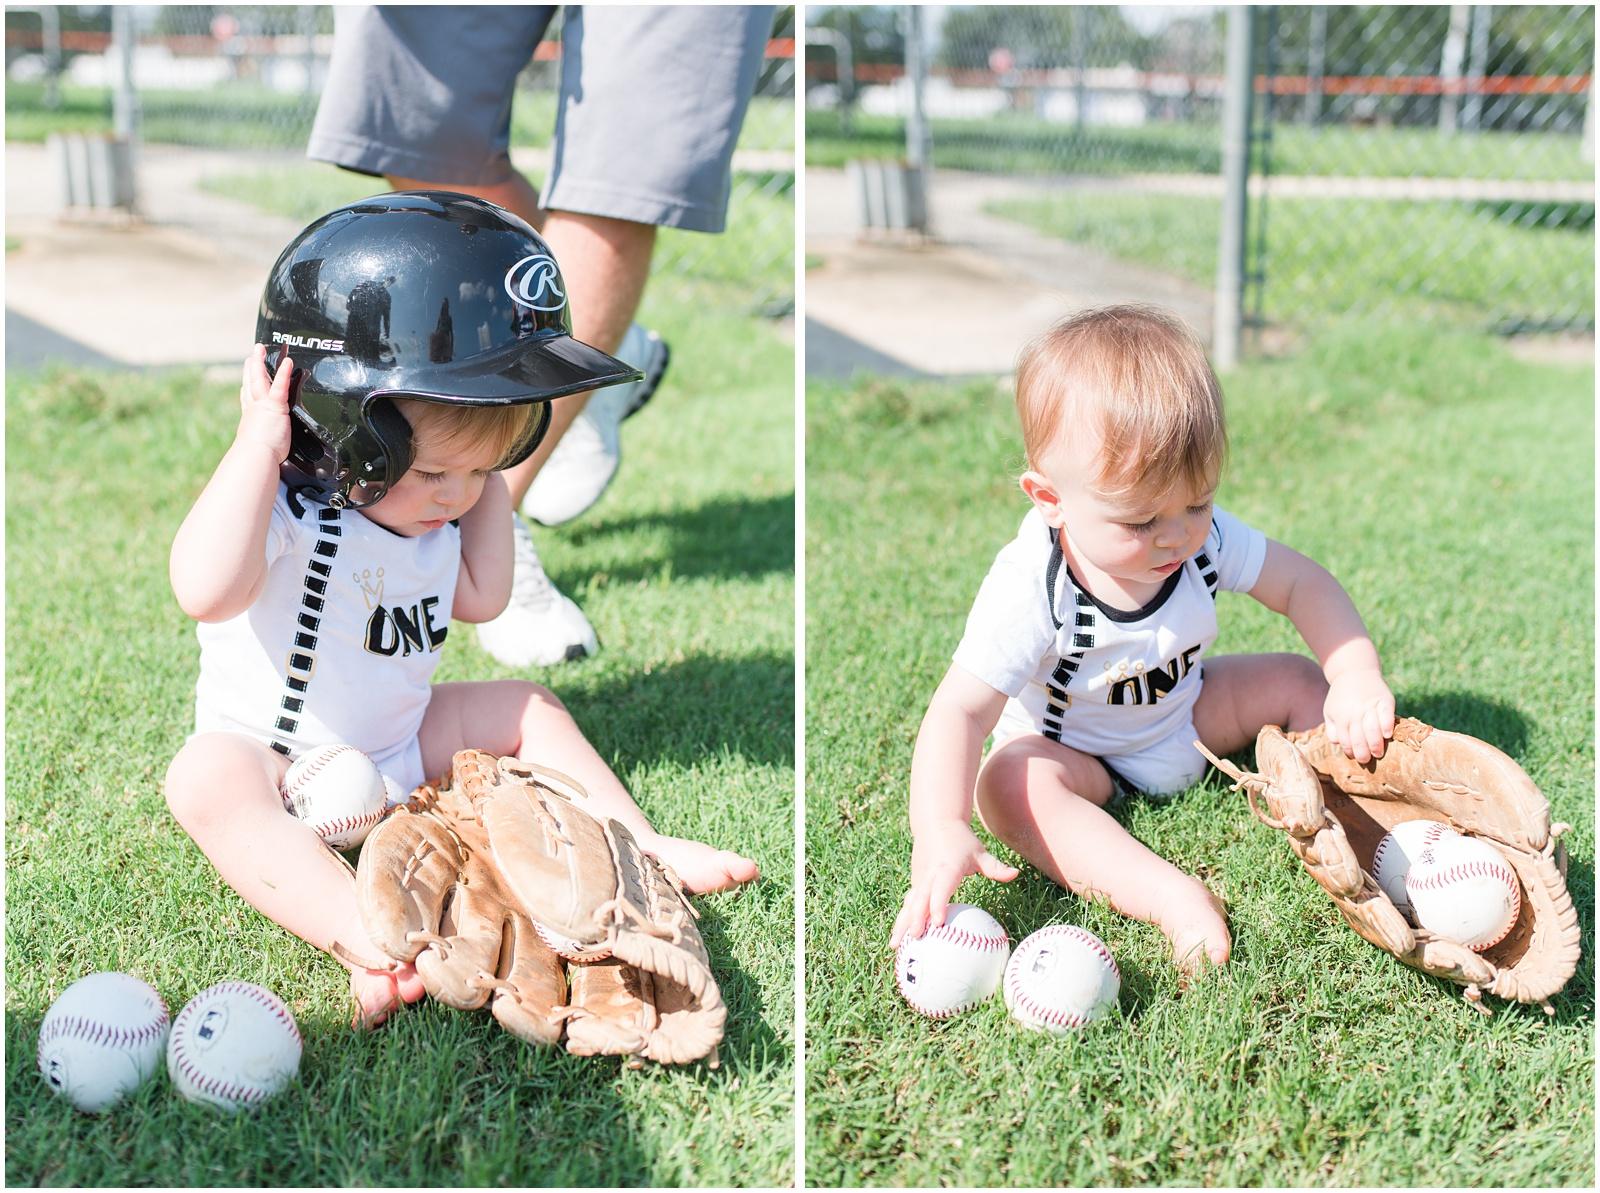 One Year_Baby_Portraits_Baseball_Field_11.jpg